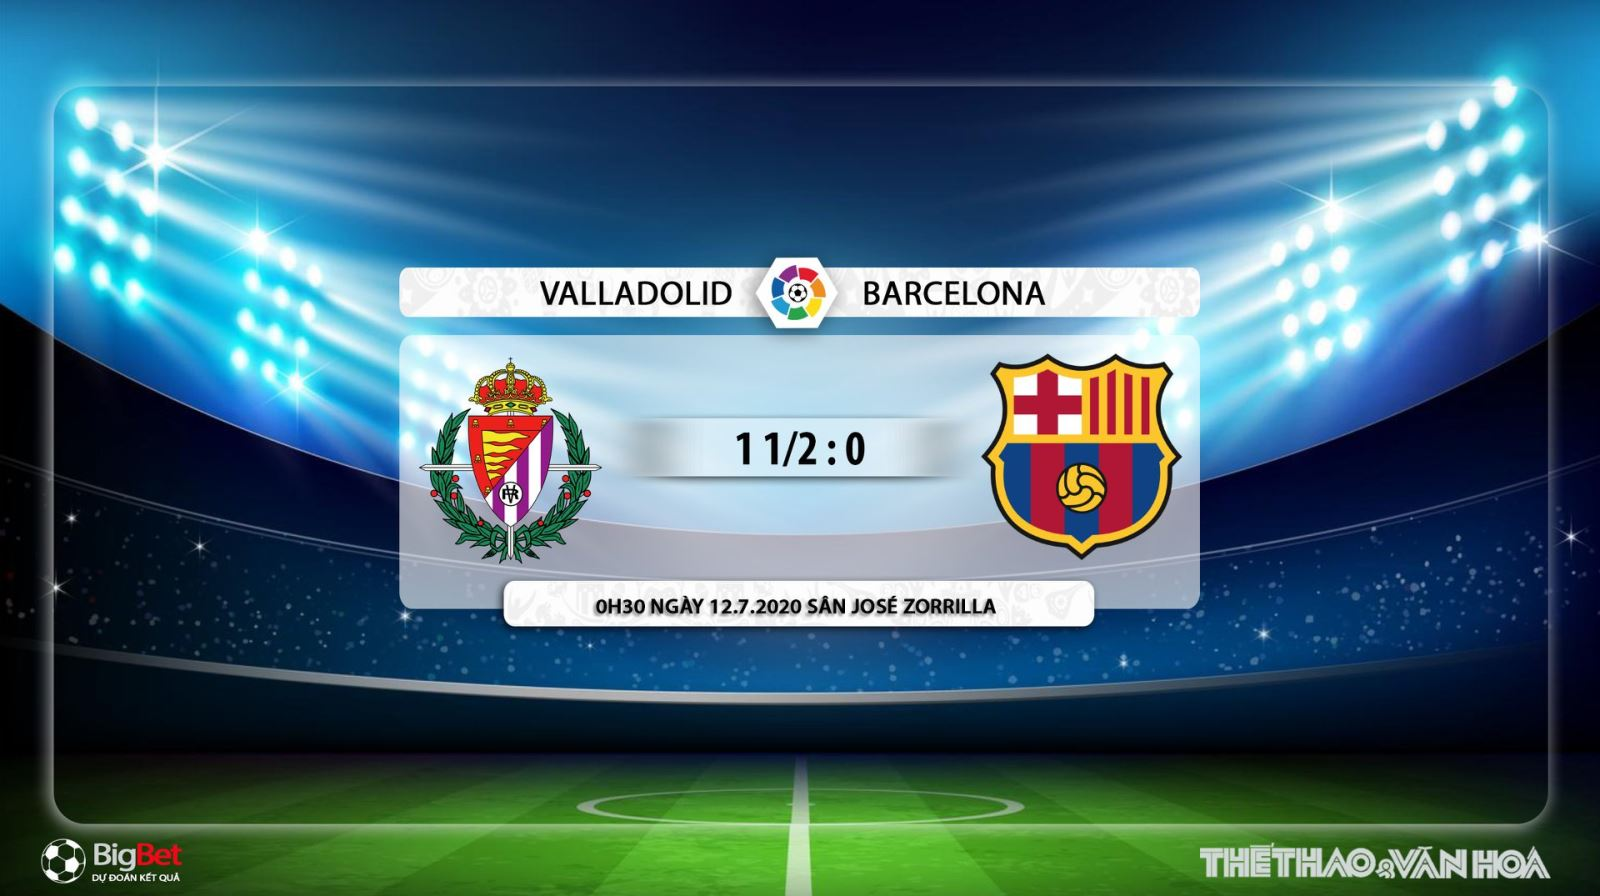 Valladolid vs Barcelona, Barca, Barcelona, trực tiếp bóng đá, bóng đá, trực tiếp Valladolid vs Barcelona, soi kèo, nhận định, kèo bóng đá